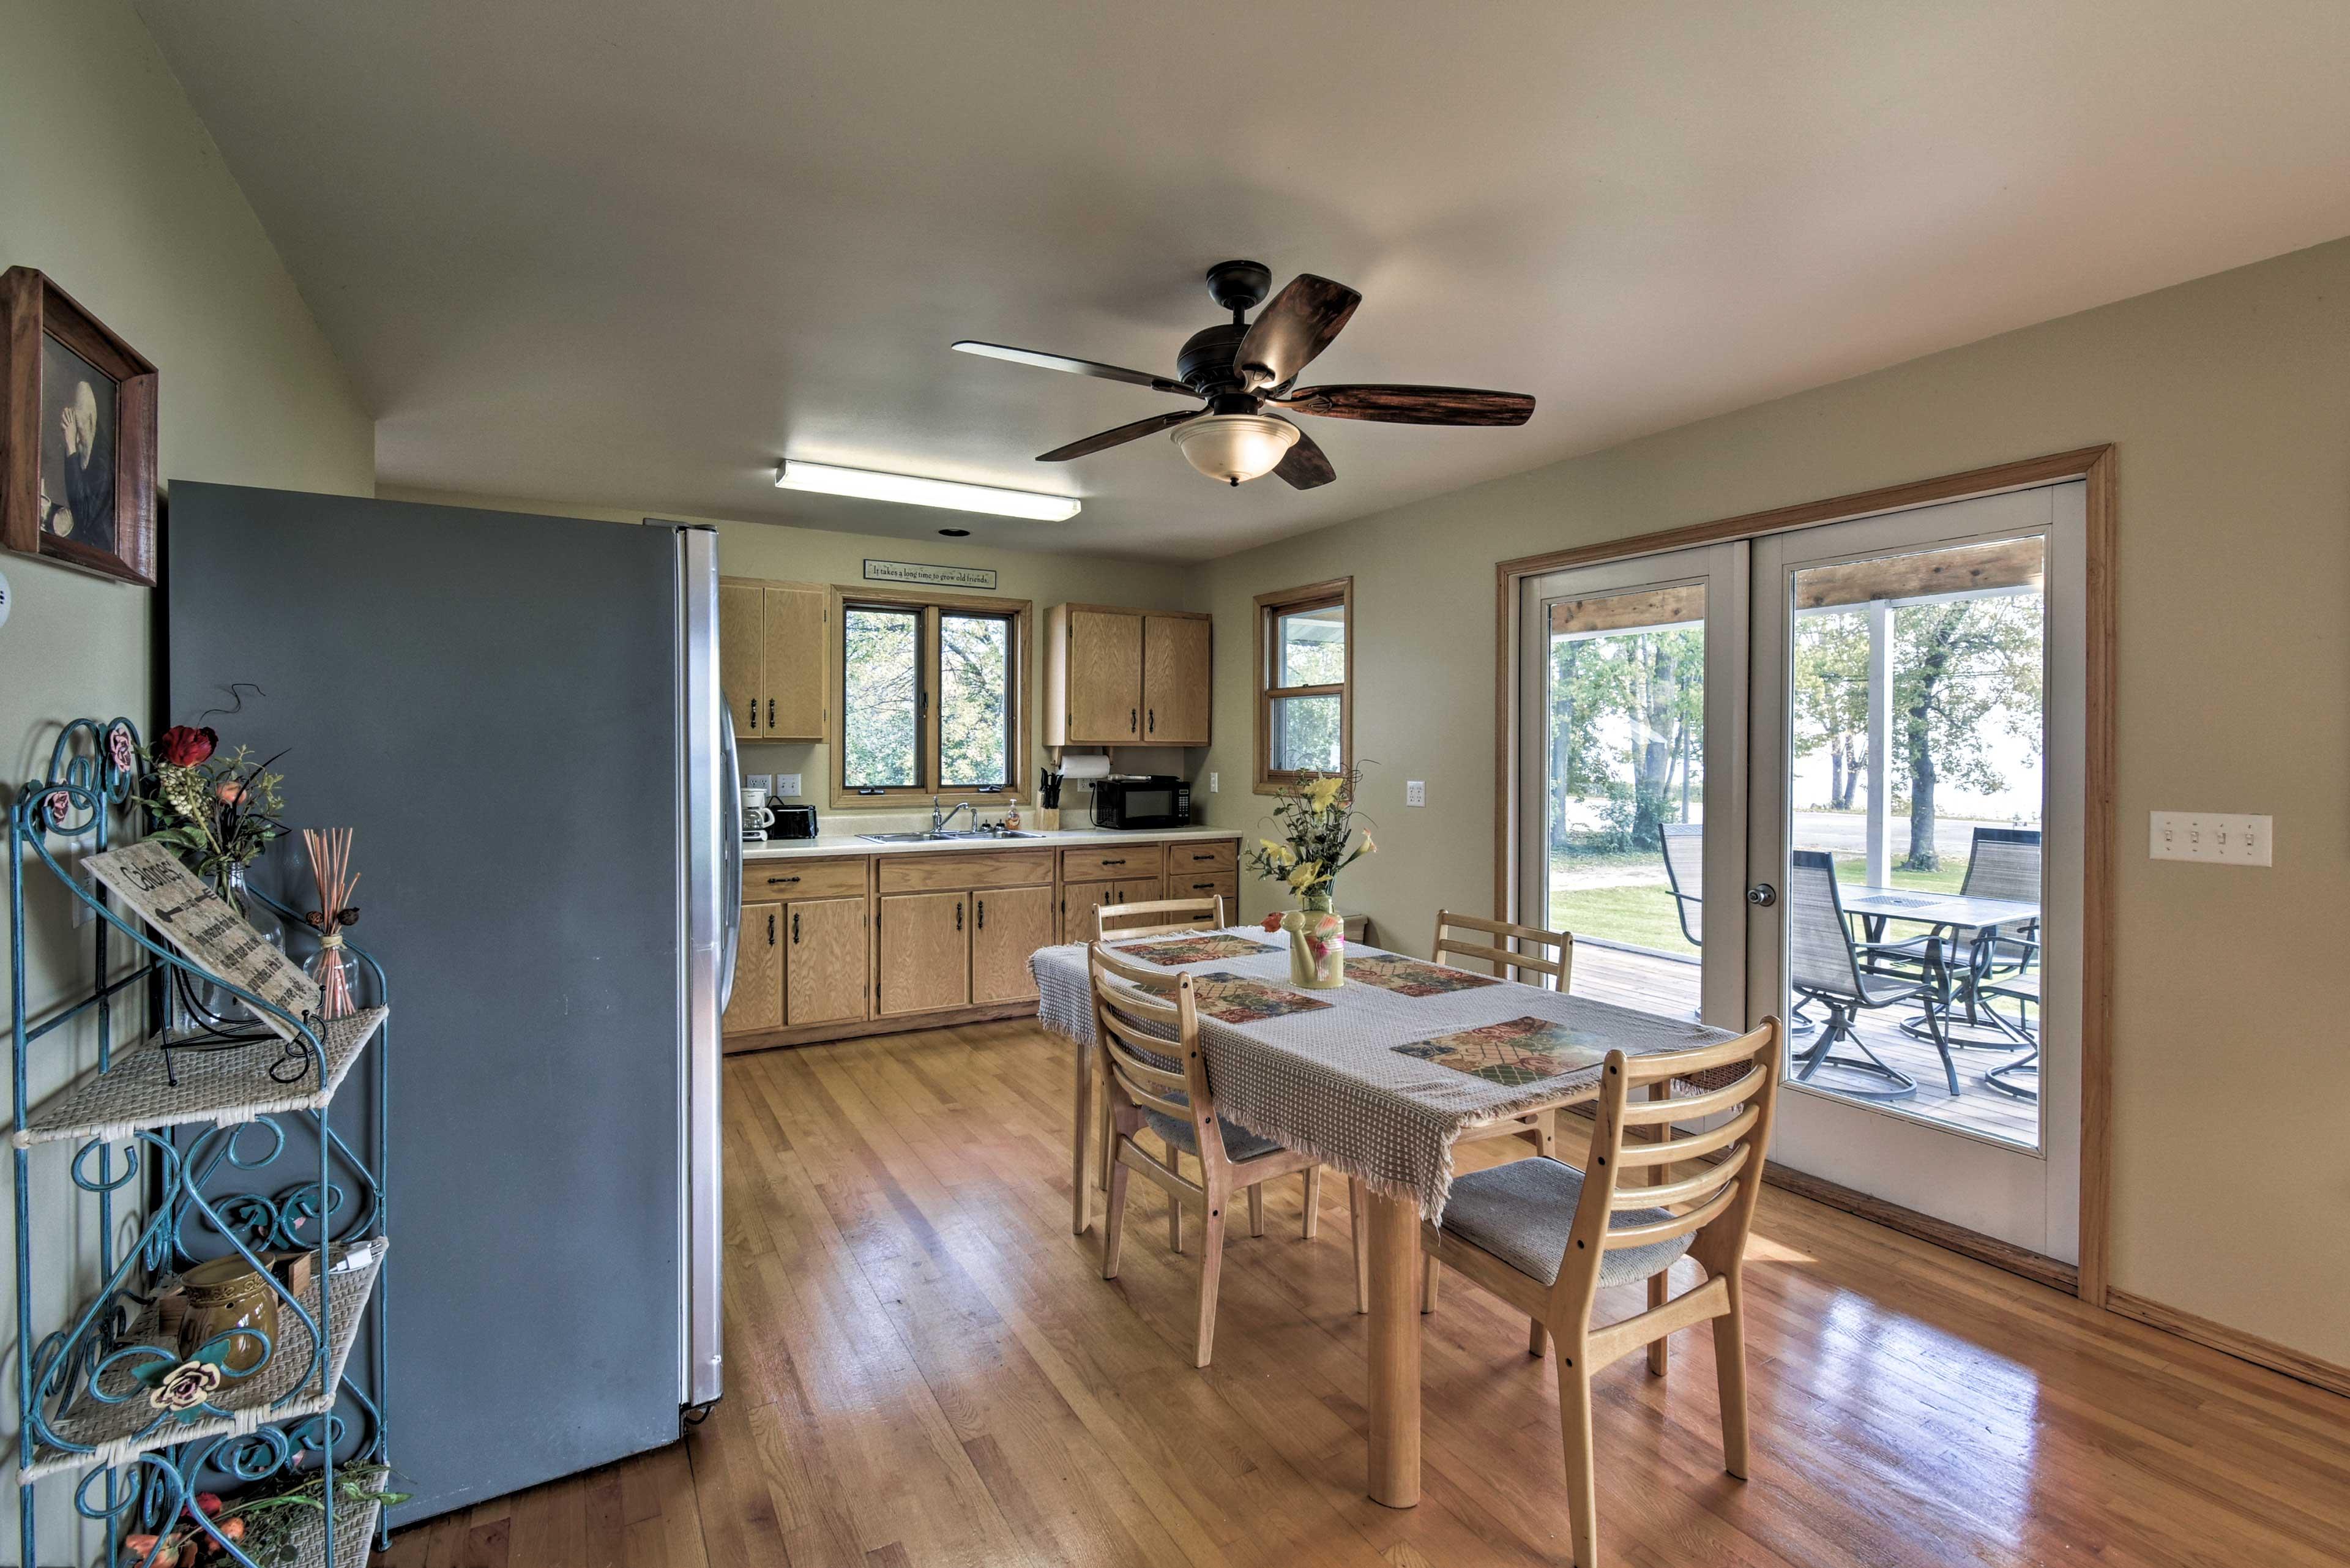 Sleek hardwood floors flow throughout the home.